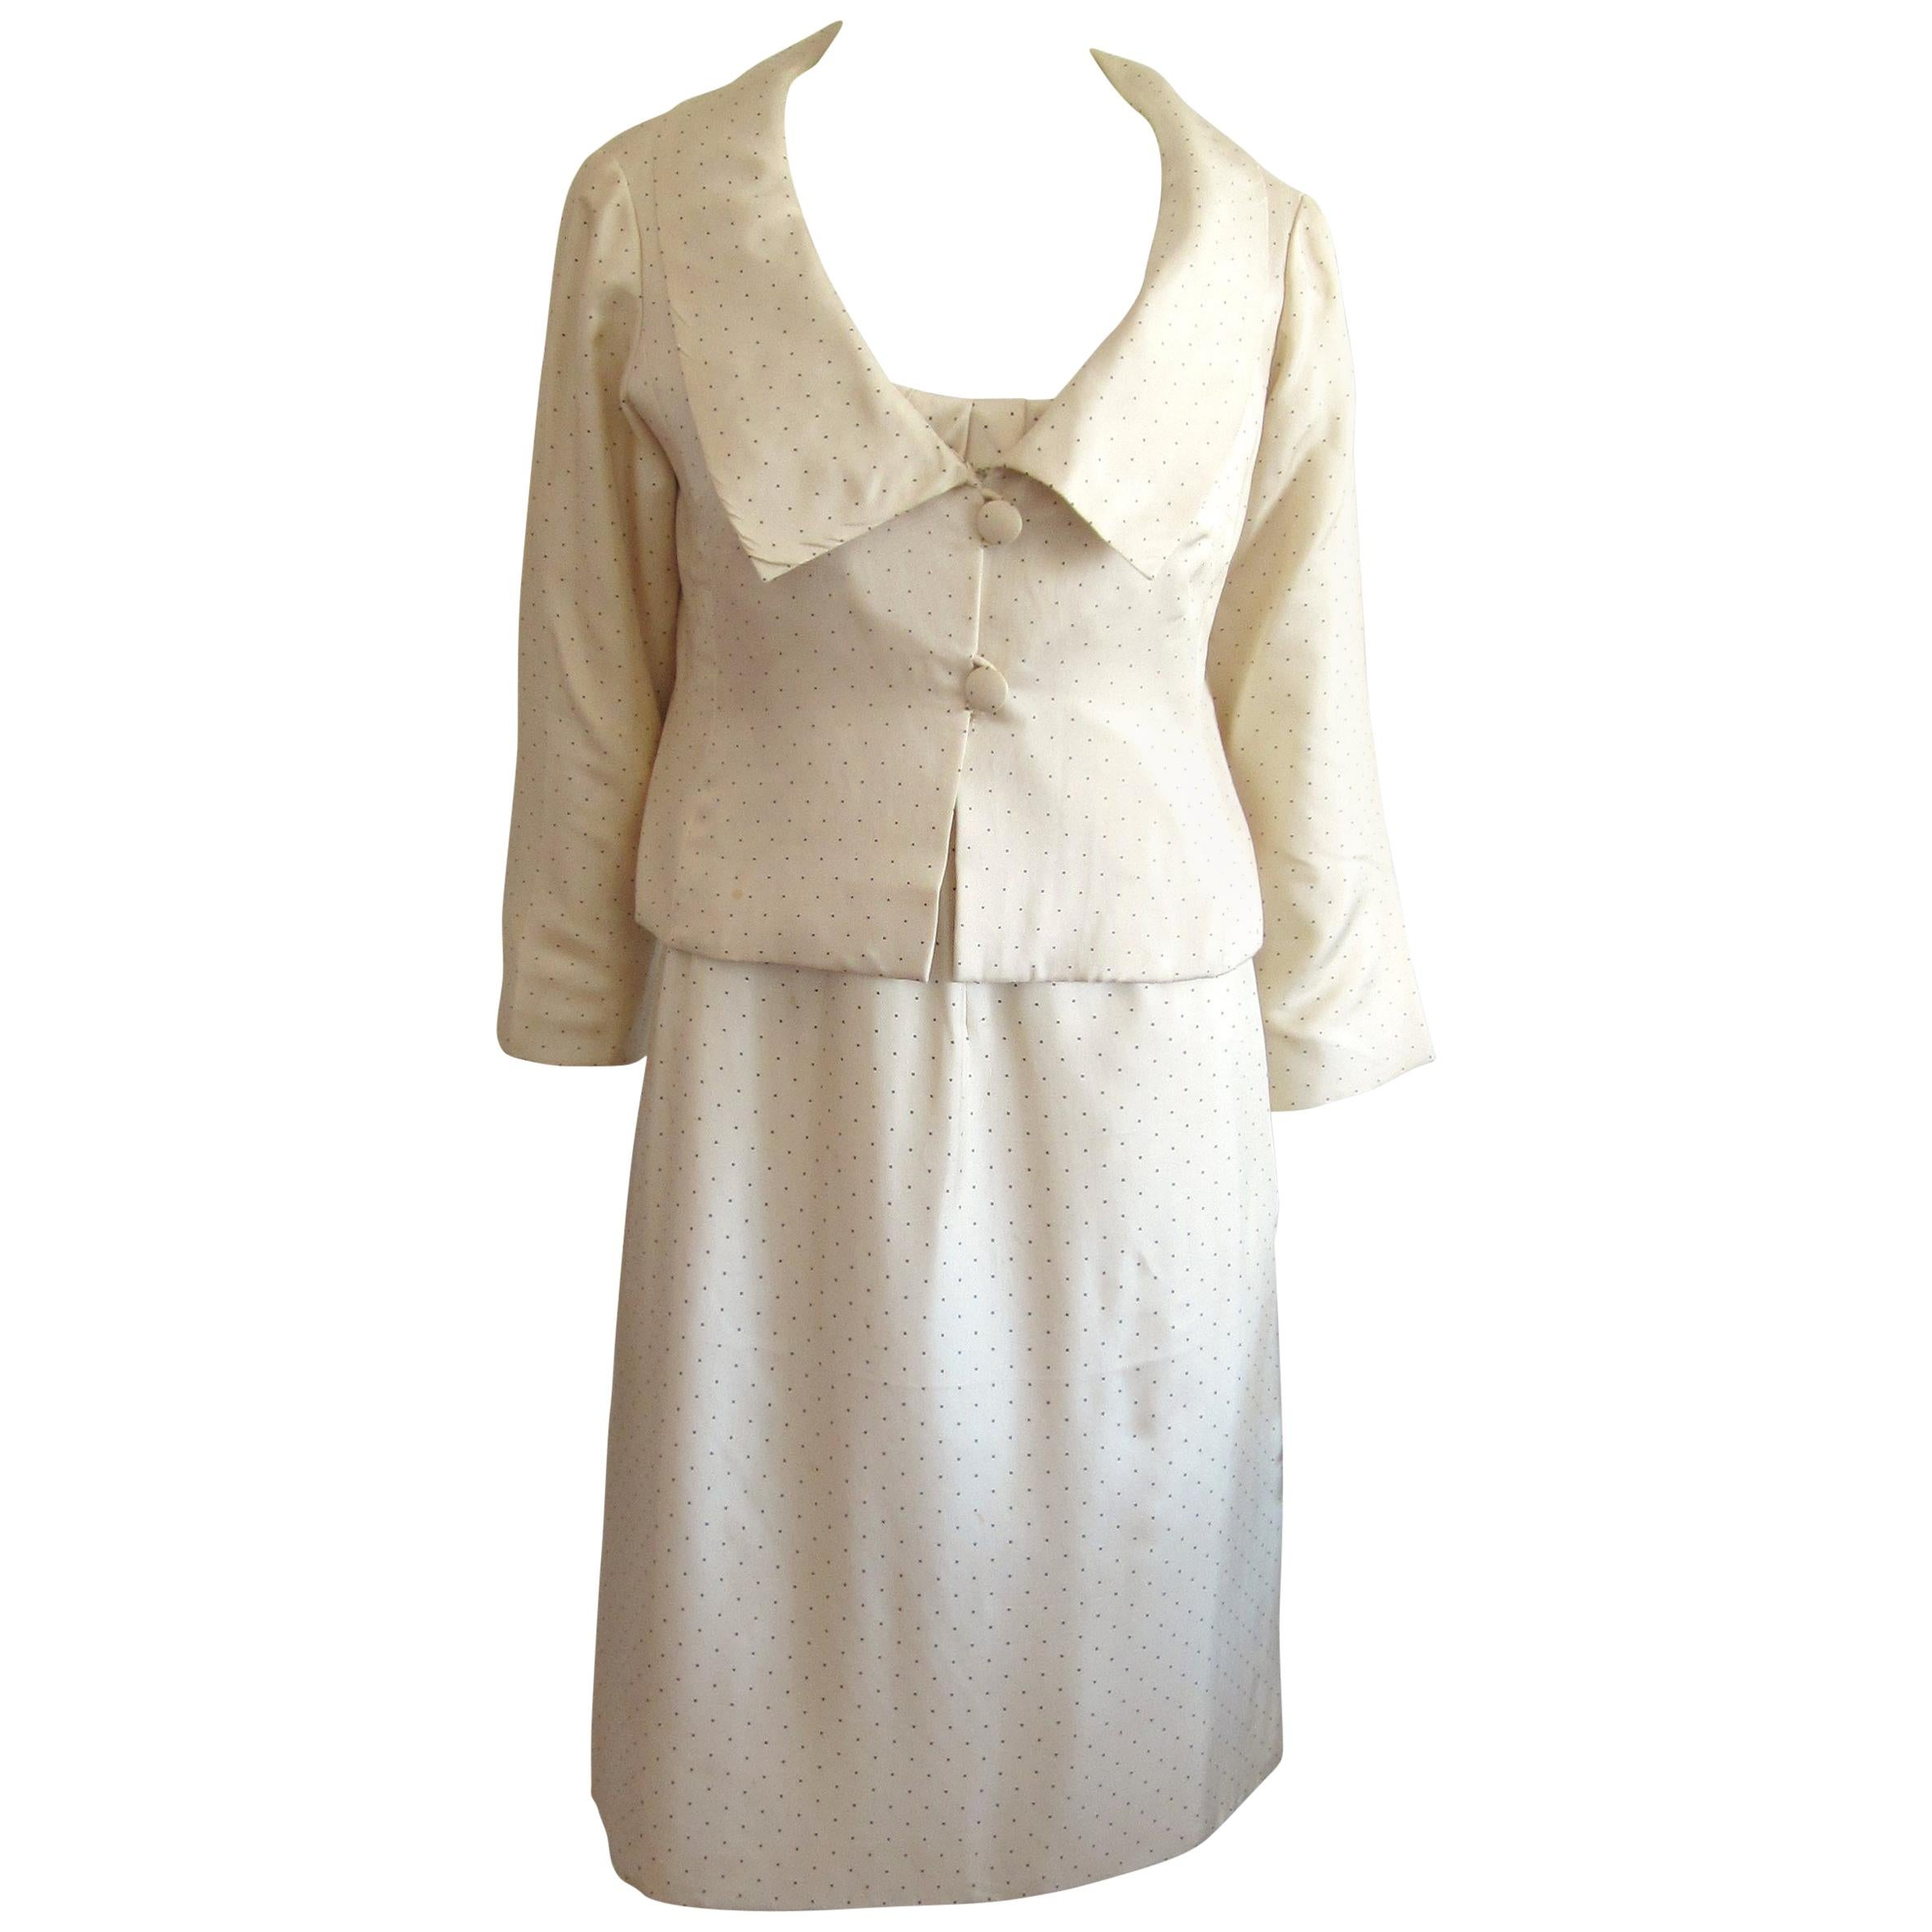 1964 Christian Dior 2 Piece Marc Bohan Dress - Jacket Suit Numbered 123094